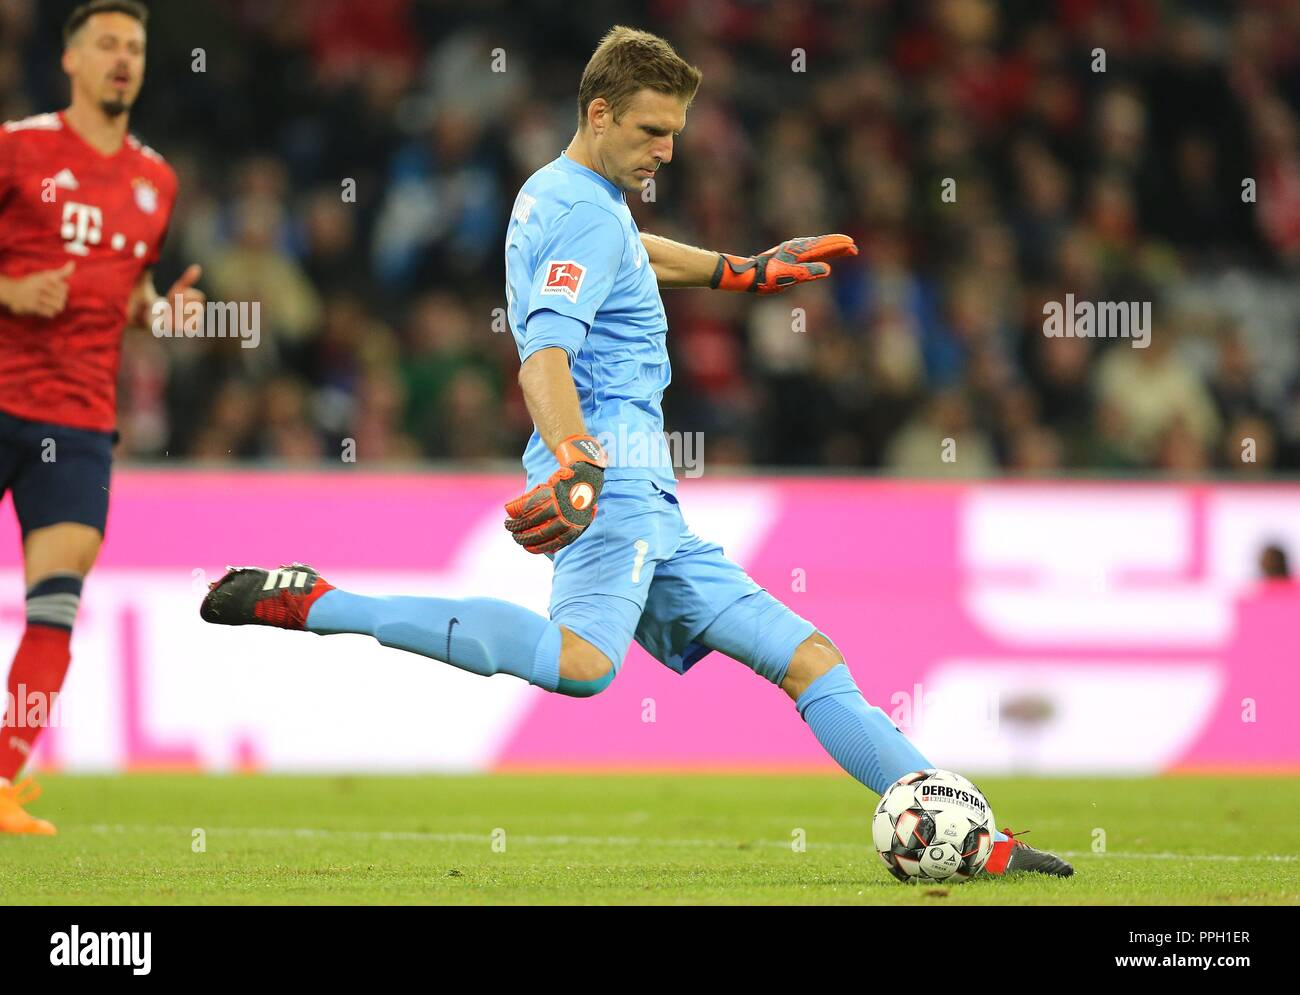 firo: 25.09.2018 Fuvuball, Football: 1.Bundesliga FC Bayern Munich - FC Augsburg, Andreas Luthe, Augsburg, single action | usage worldwide Stock Photo